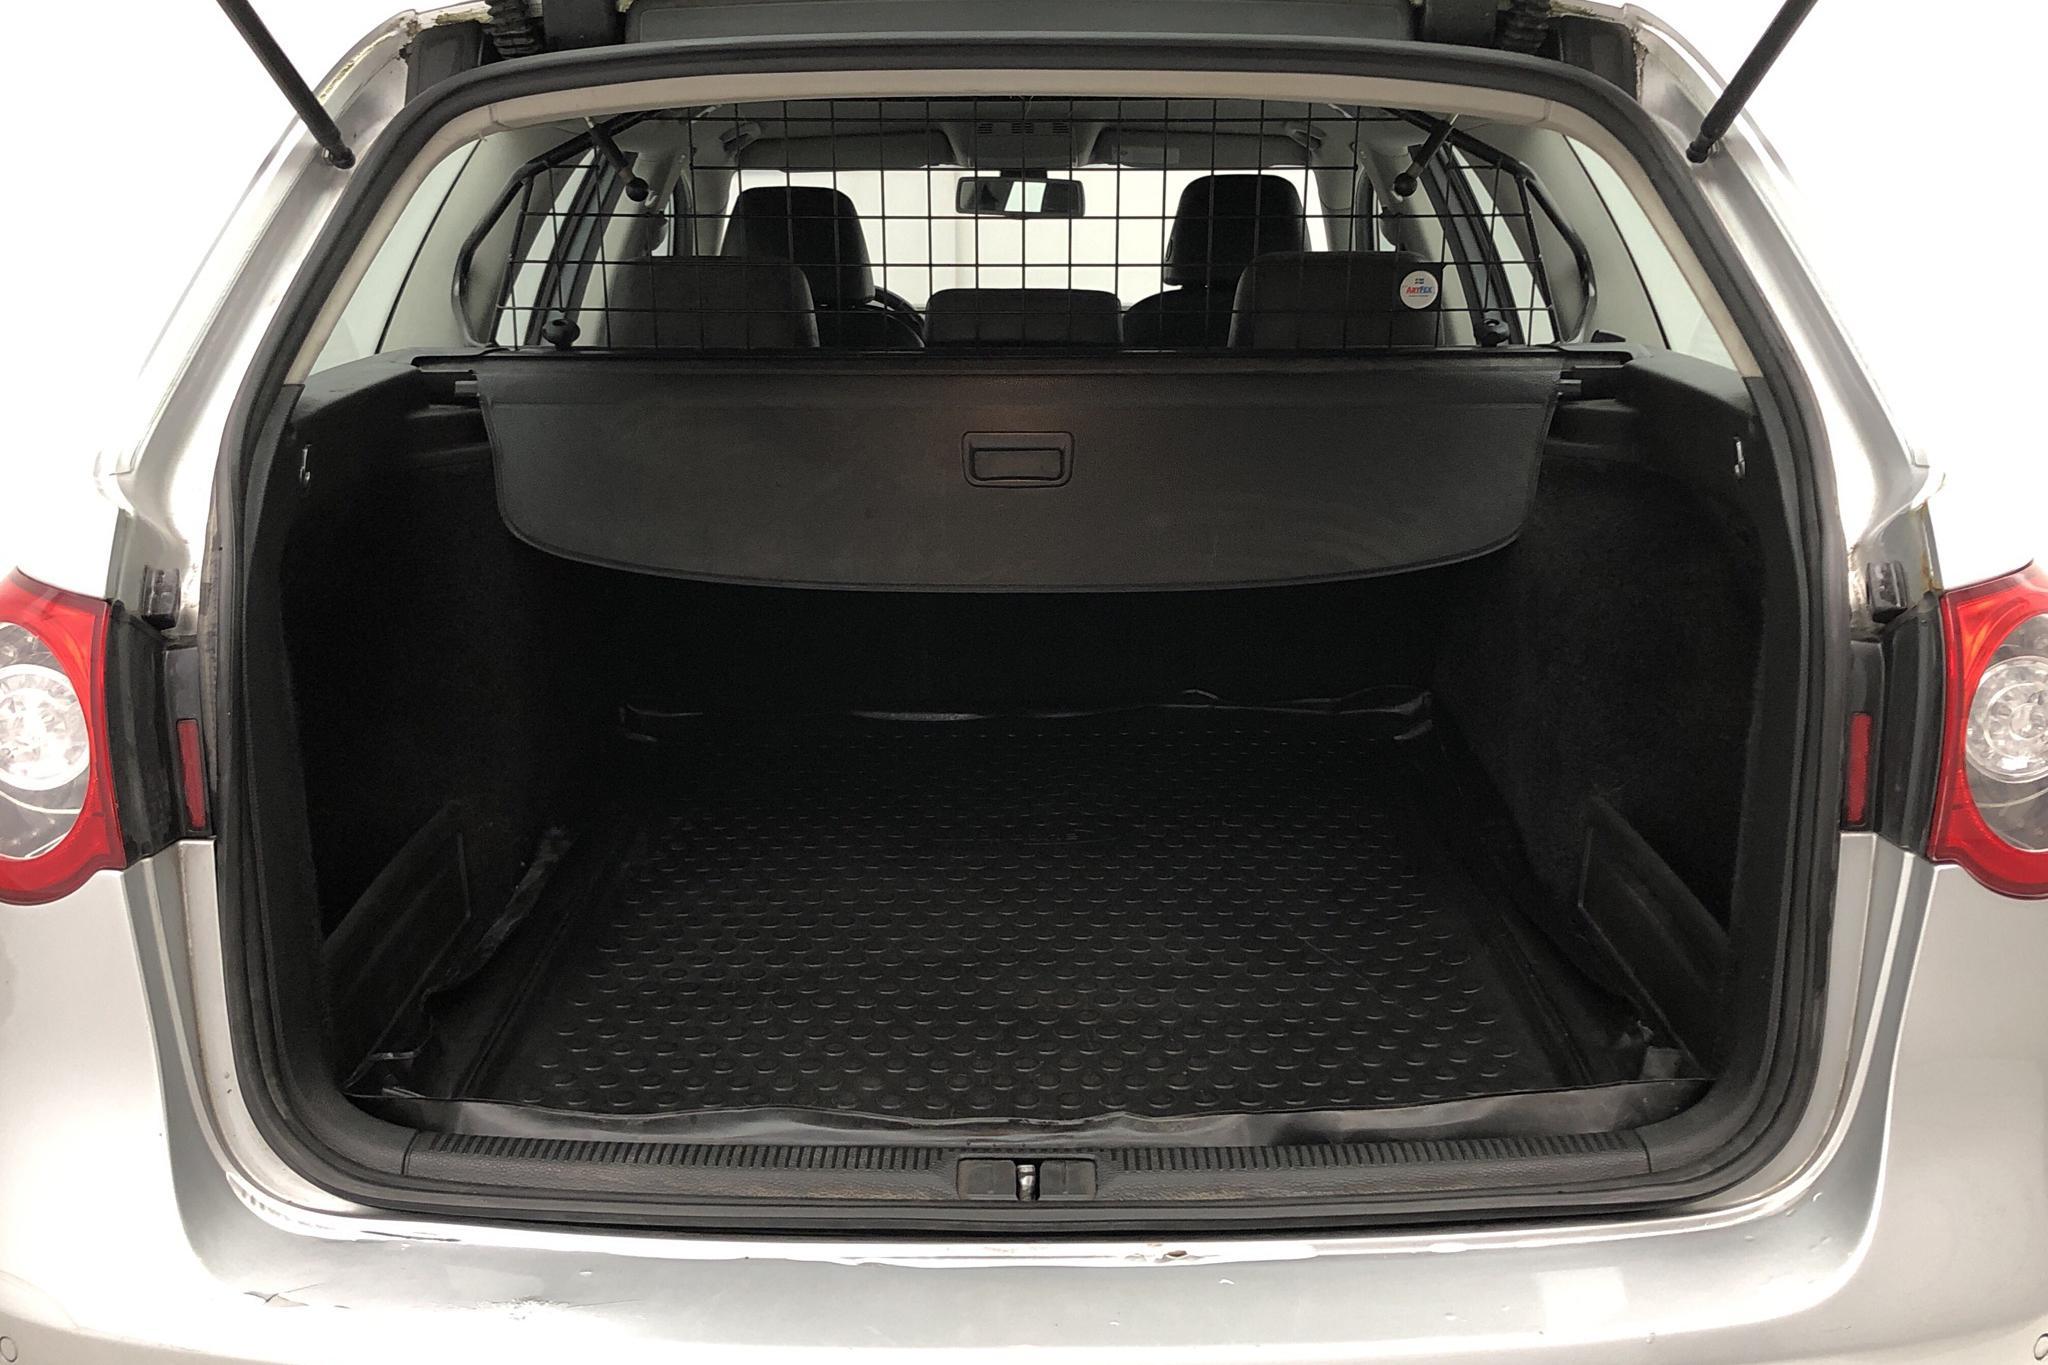 VW Passat 2.0 TDI Variant (170hk) - 209 930 km - Automatic - silver - 2008